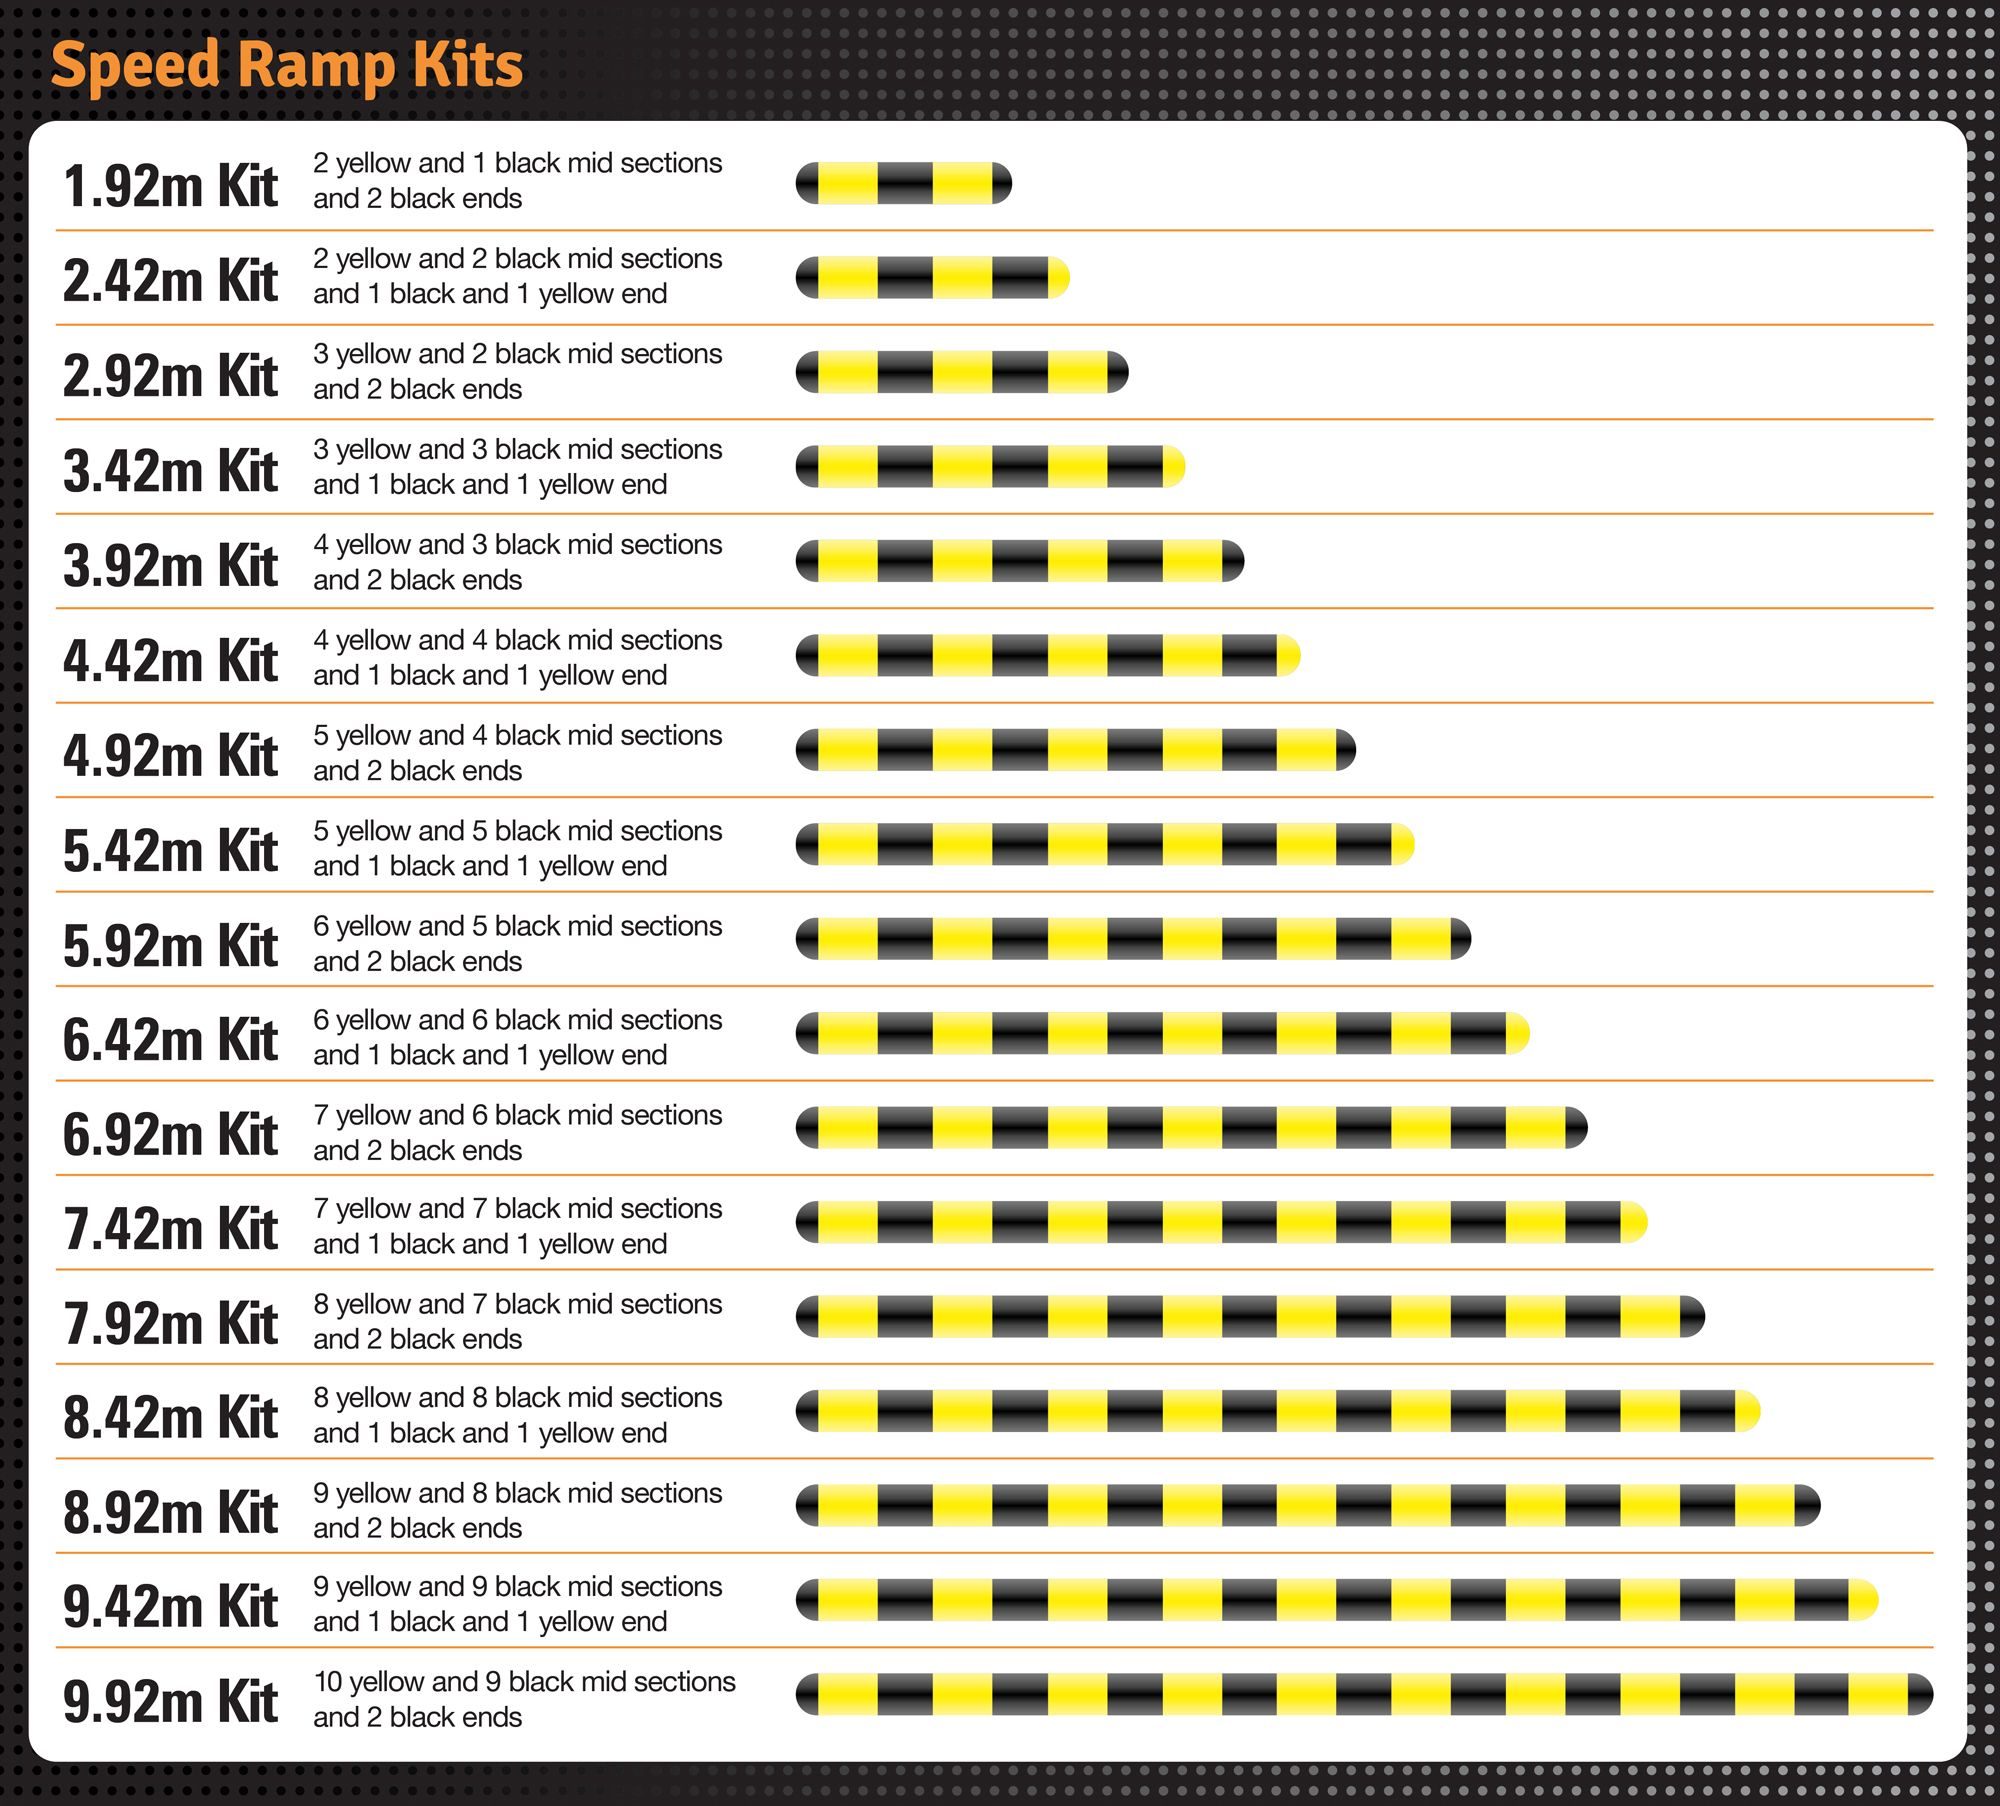 Speed ramp kits